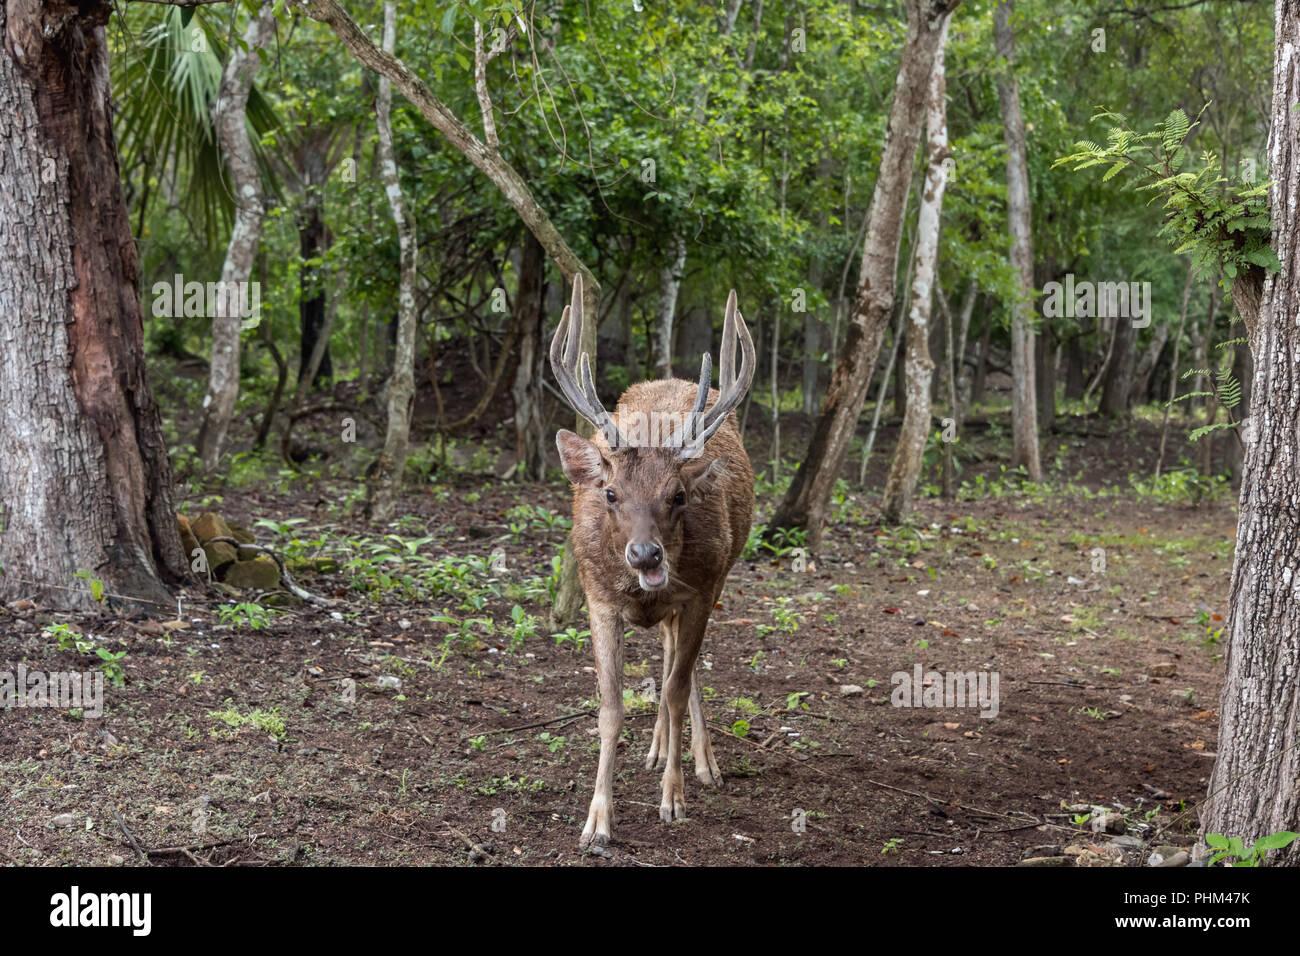 Timor rusa deer (Cervus timorensis) in the woods on Komodo Island, Indonesia - Stock Image